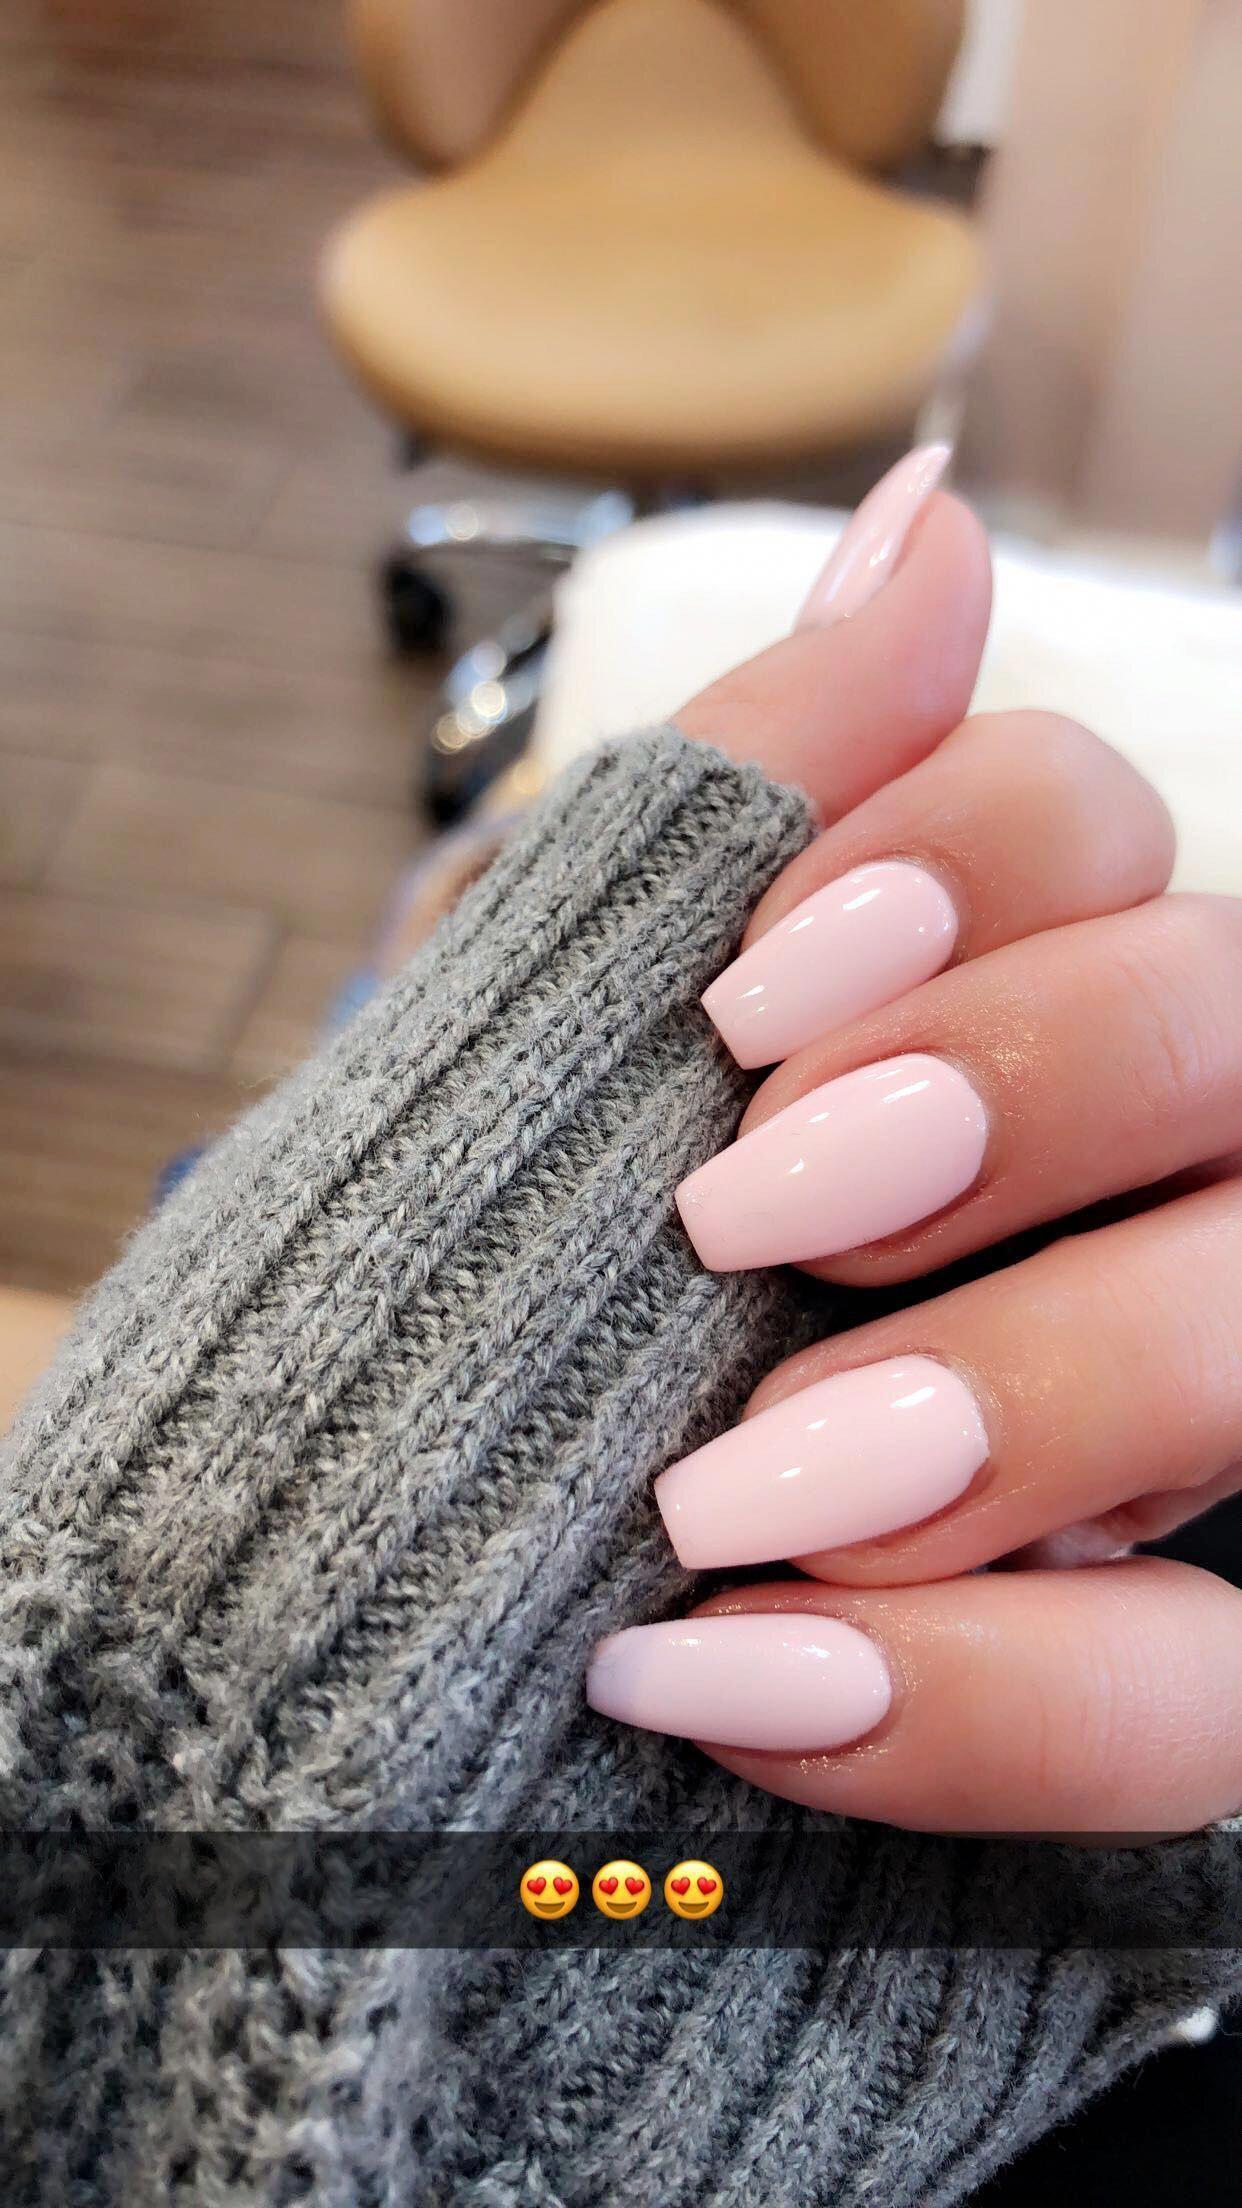 Acrylic Coffin Pink Nails Acrylicnails Acrylic Nails Pastel Pink Nails Coffin Nails Designs